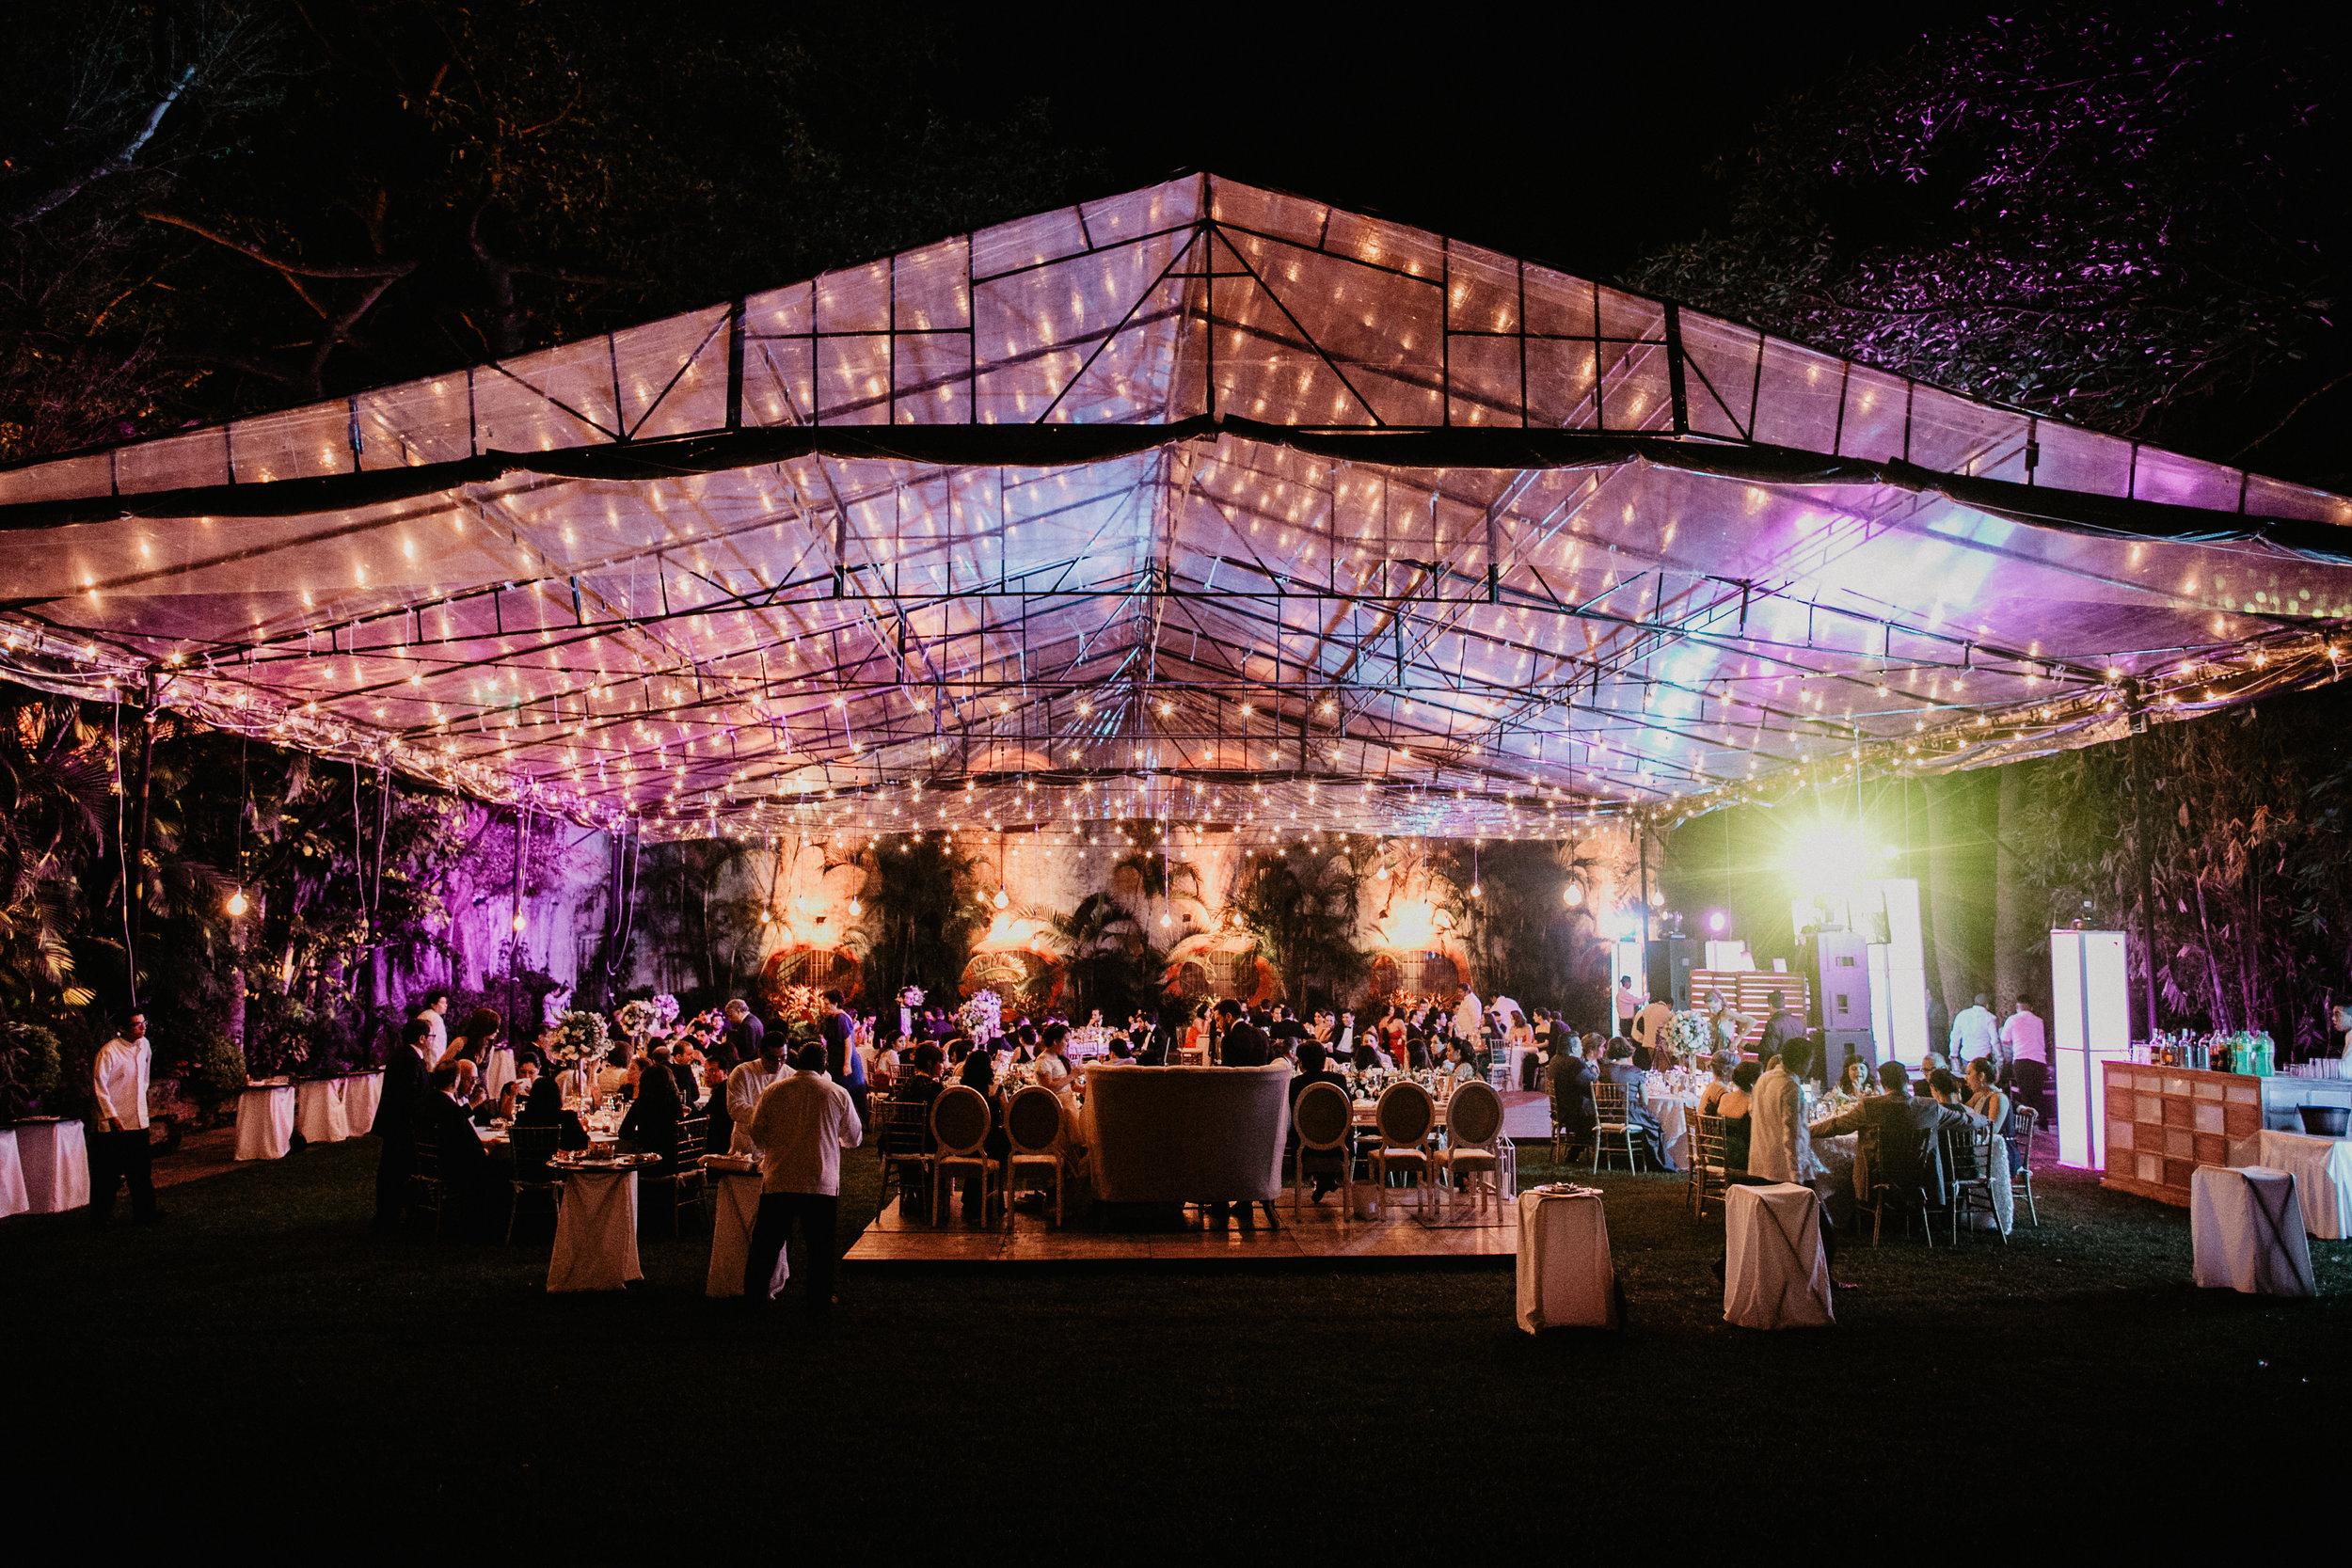 Alfonso_flores_destination_wedding_photography_vanesa_carlos-954.JPG